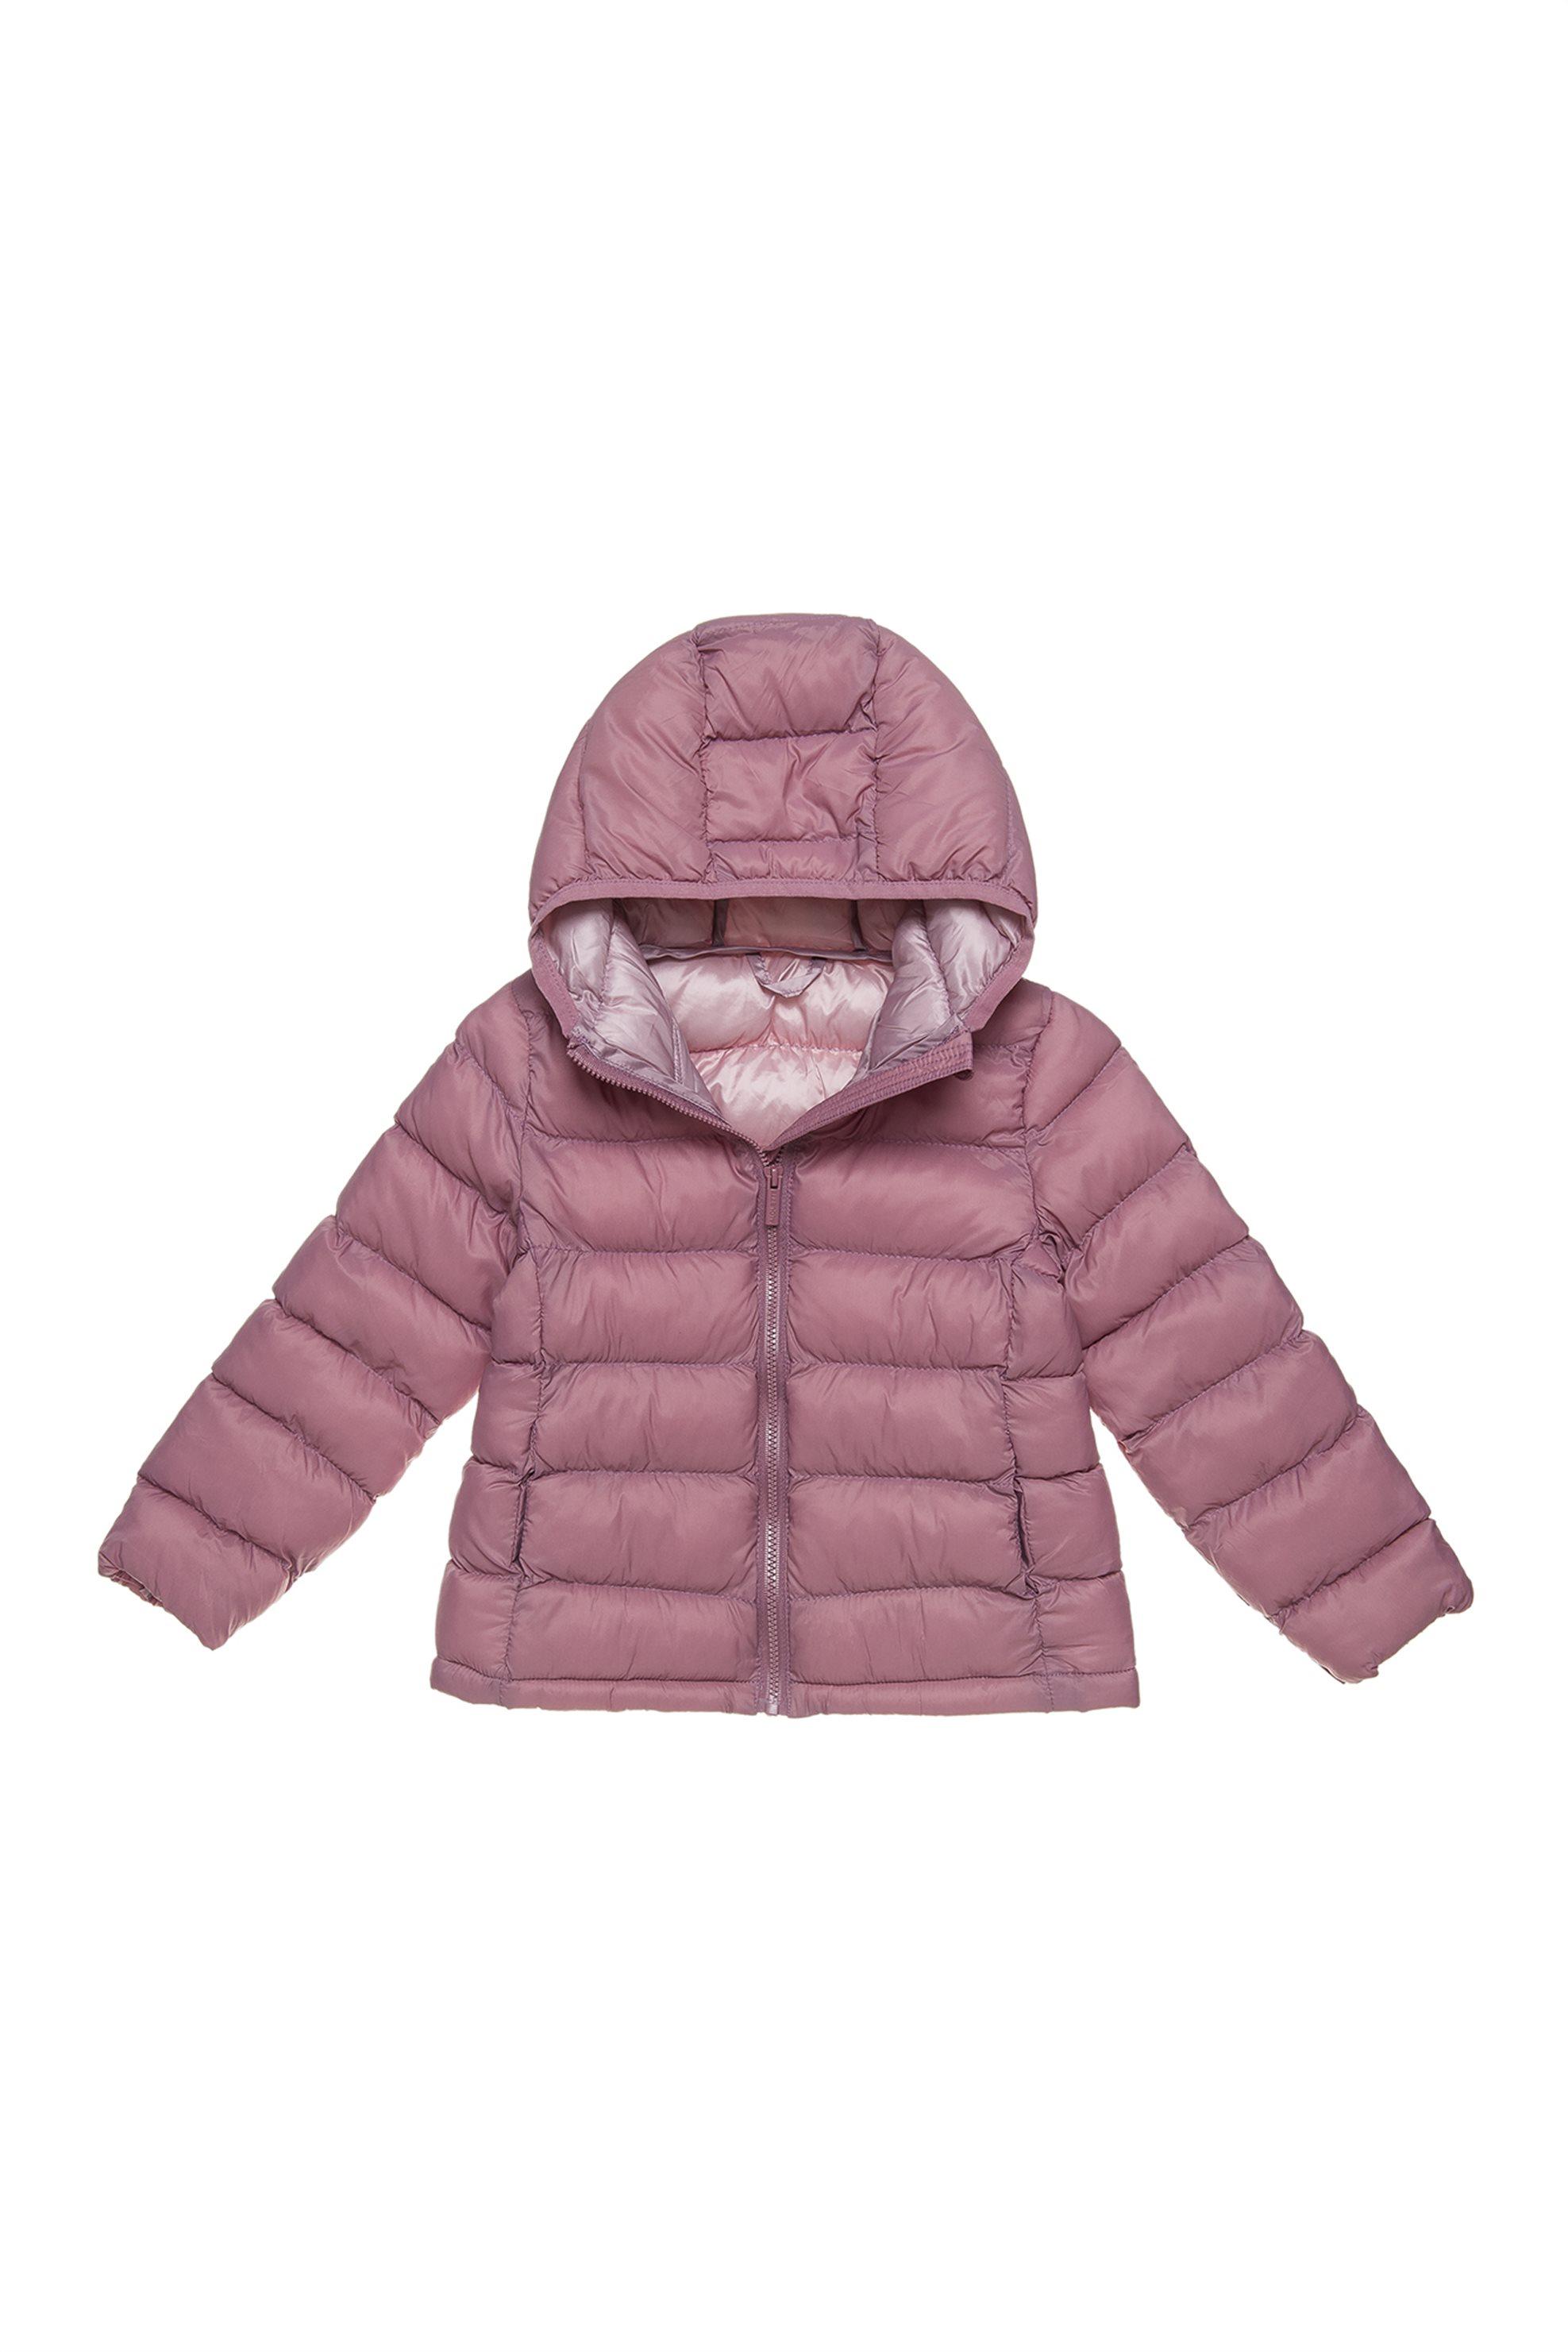 Alouette παιδικό μπουφάν καπιτονέ με κουκούλα - 00260959 - Ροζ παιδι   βρεφικα κοριτσι   0 3 ετων   ρούχα   παλτό   μπουφάν